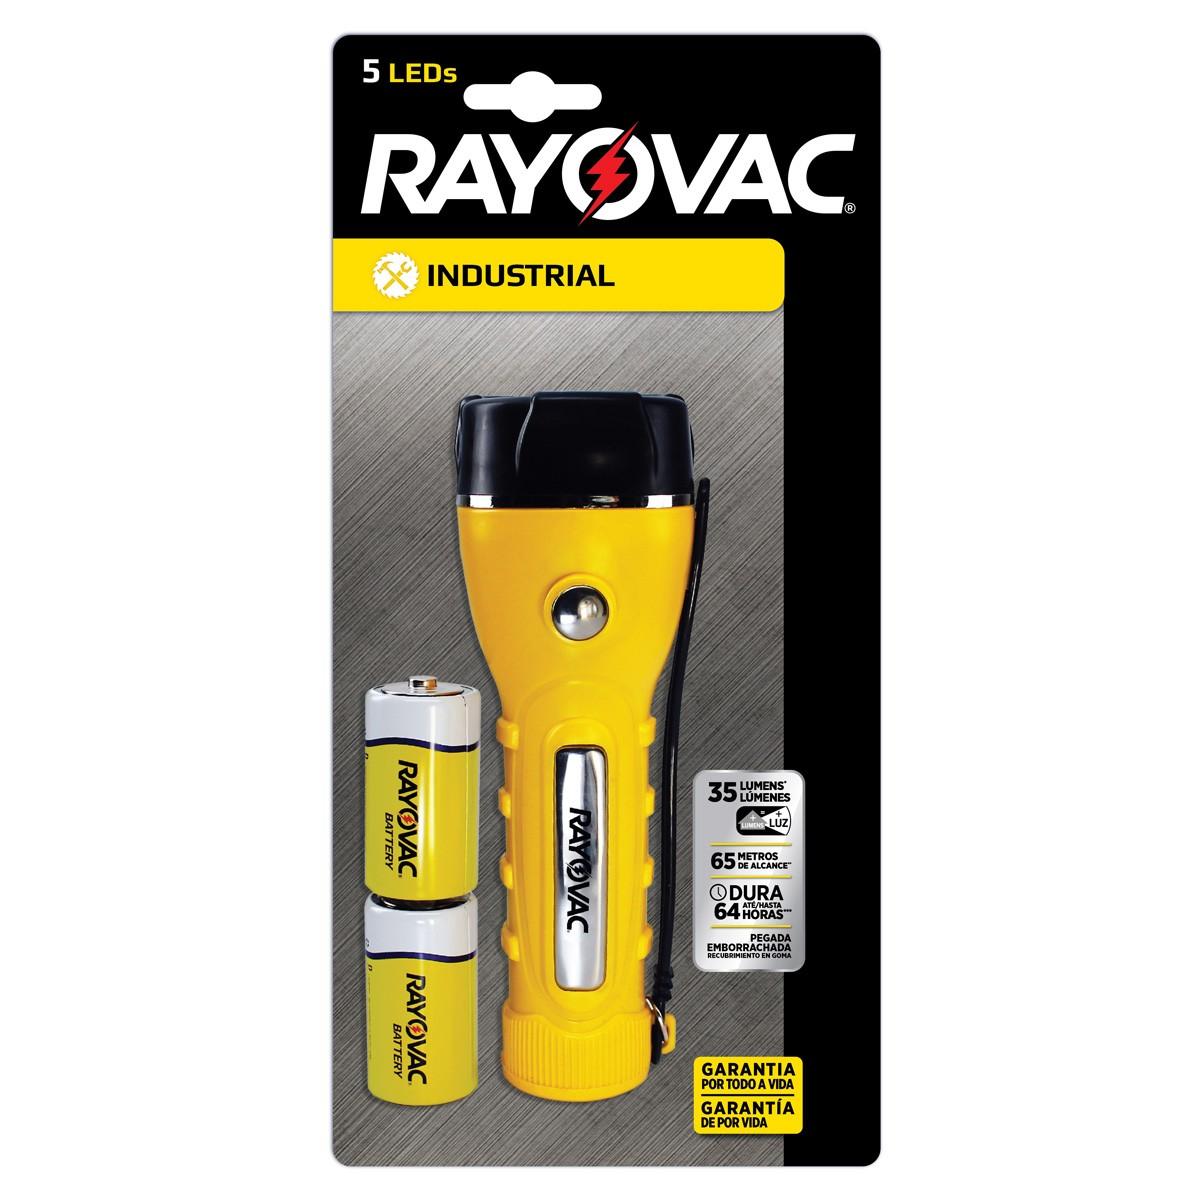 06 LANTERNAS Profissionais 5 LEDs RAYOVAC